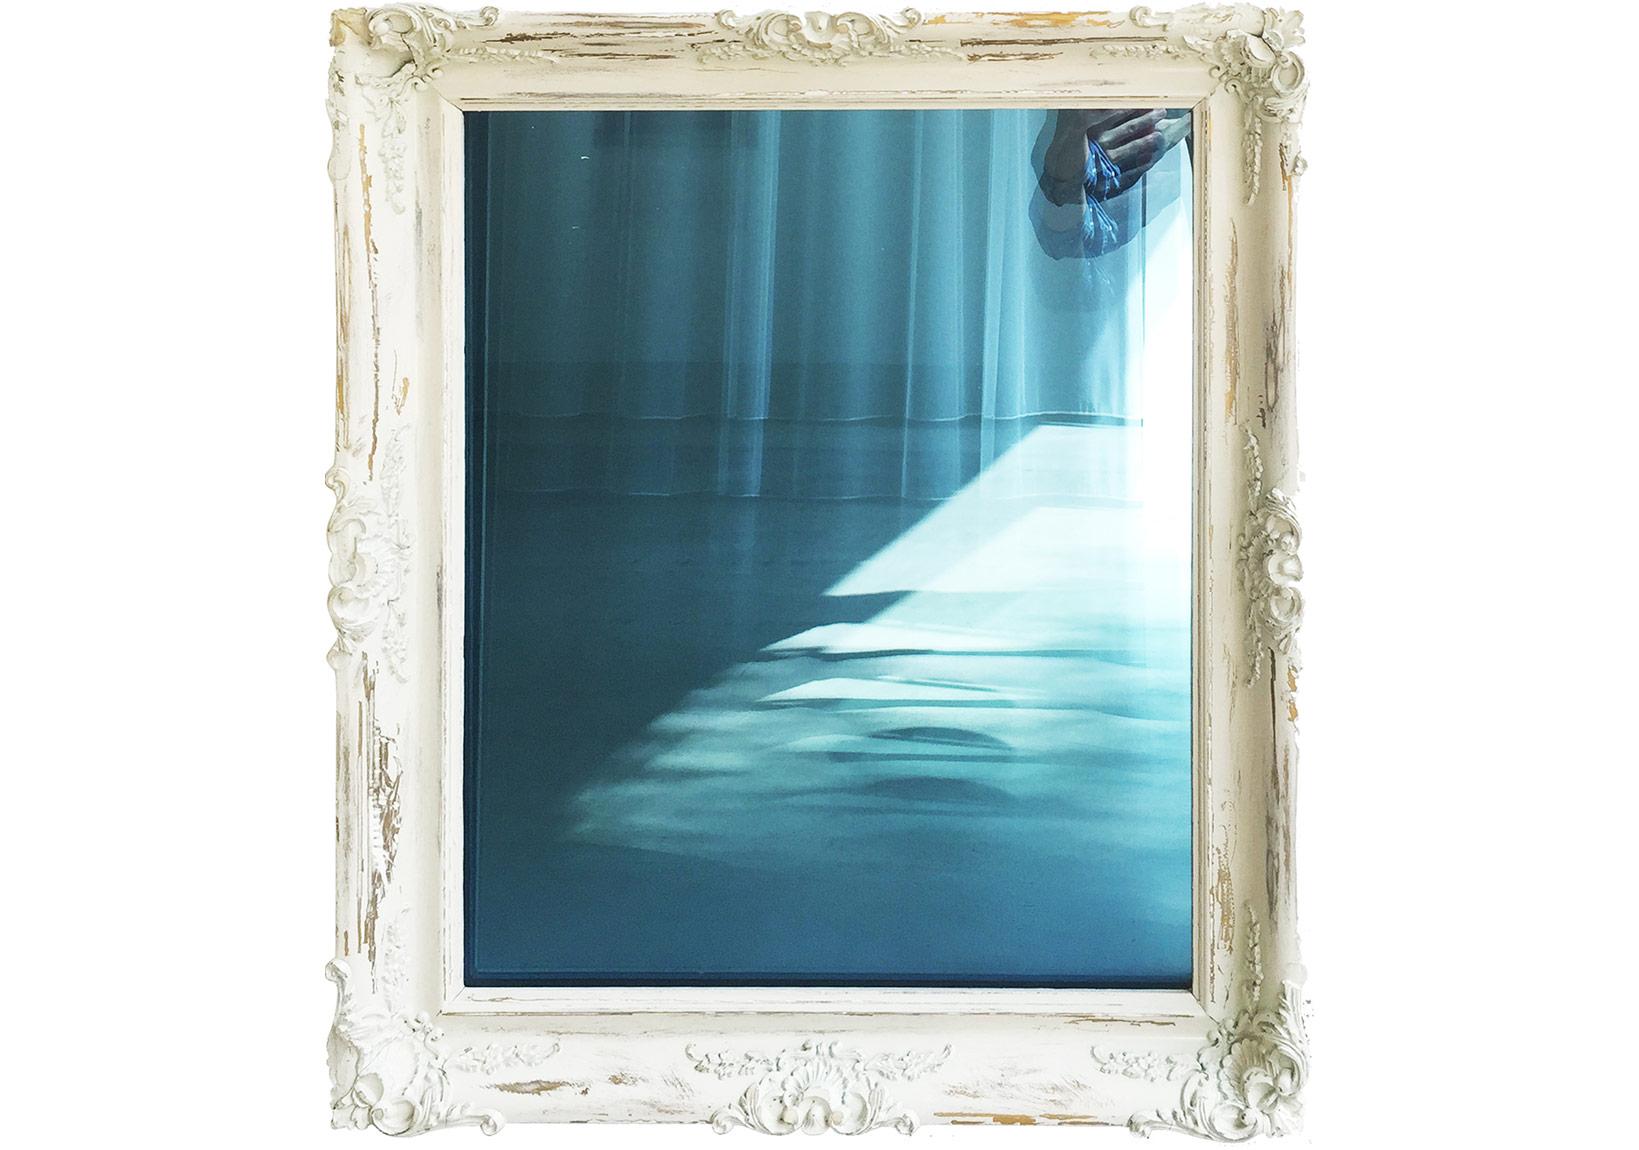 Ayşe Gül Süter'acid vision' serisinden (2015) Mixed media64 x 54 cm